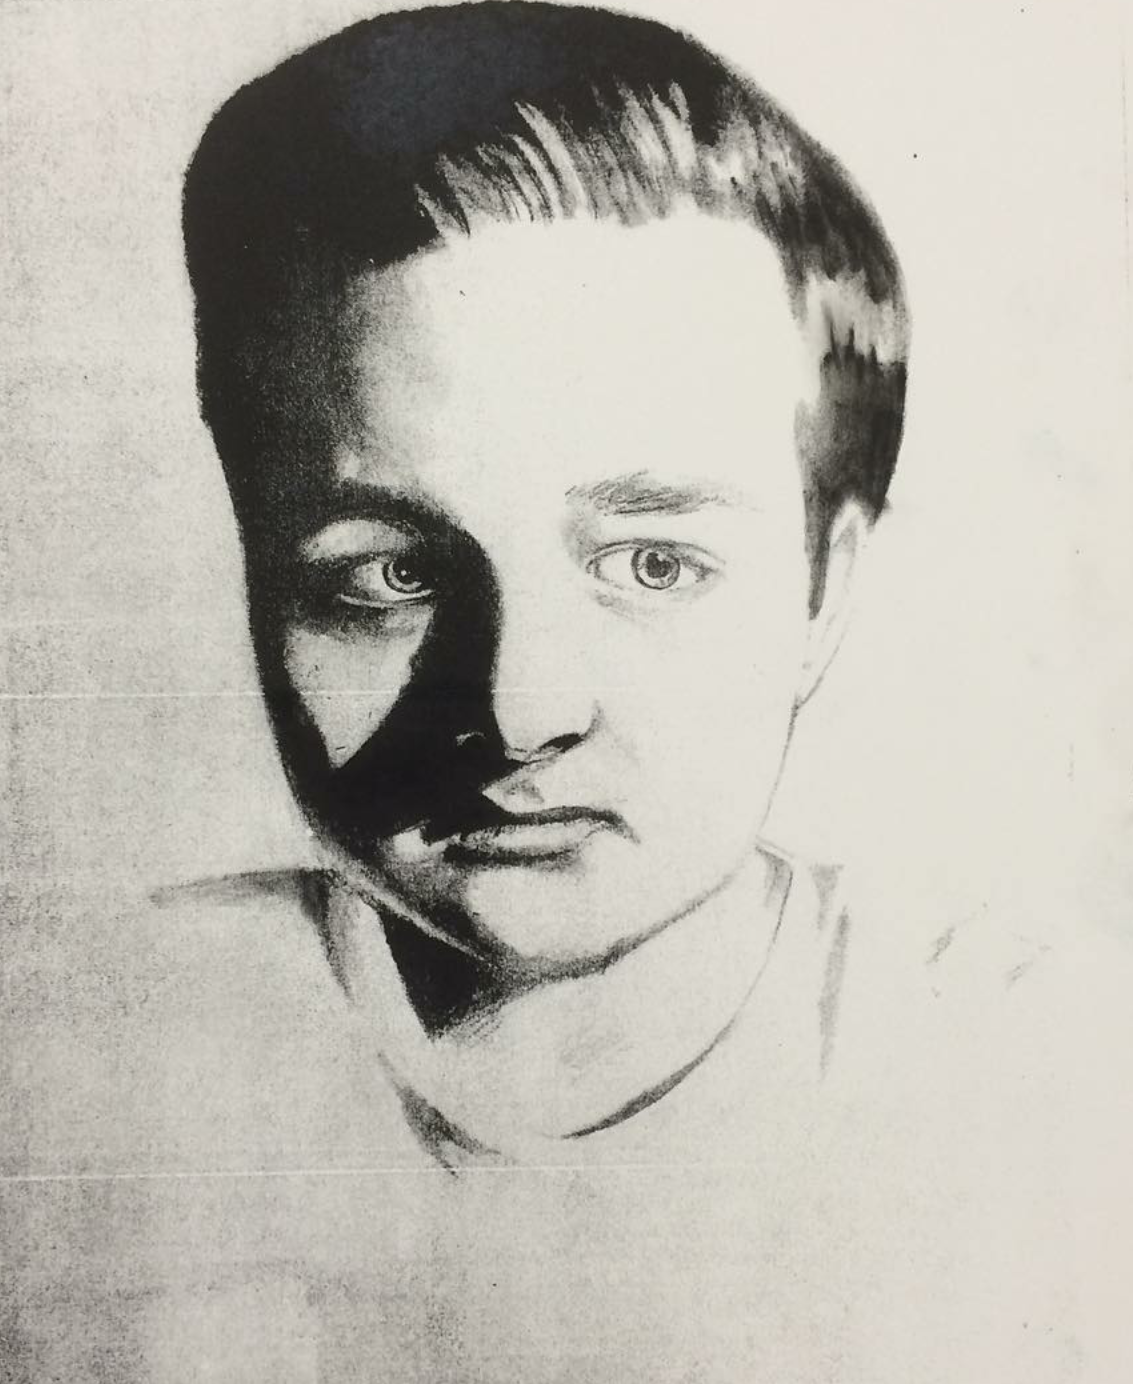 """Artist's Self Portrait"" -2015 Lithograph print on Bristol"